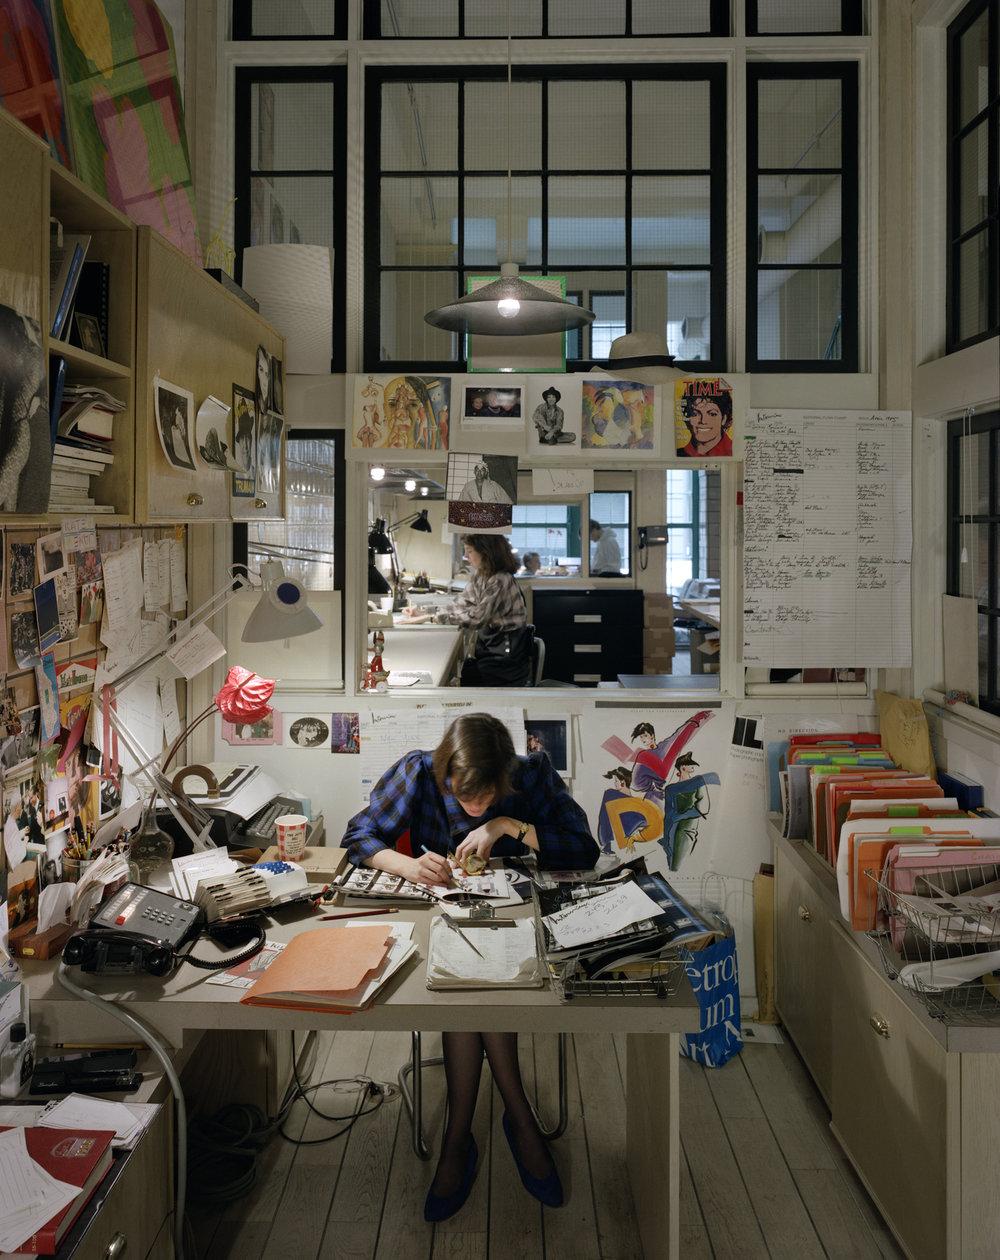 Amdy Warhol Factory - 34th & Madison, NY